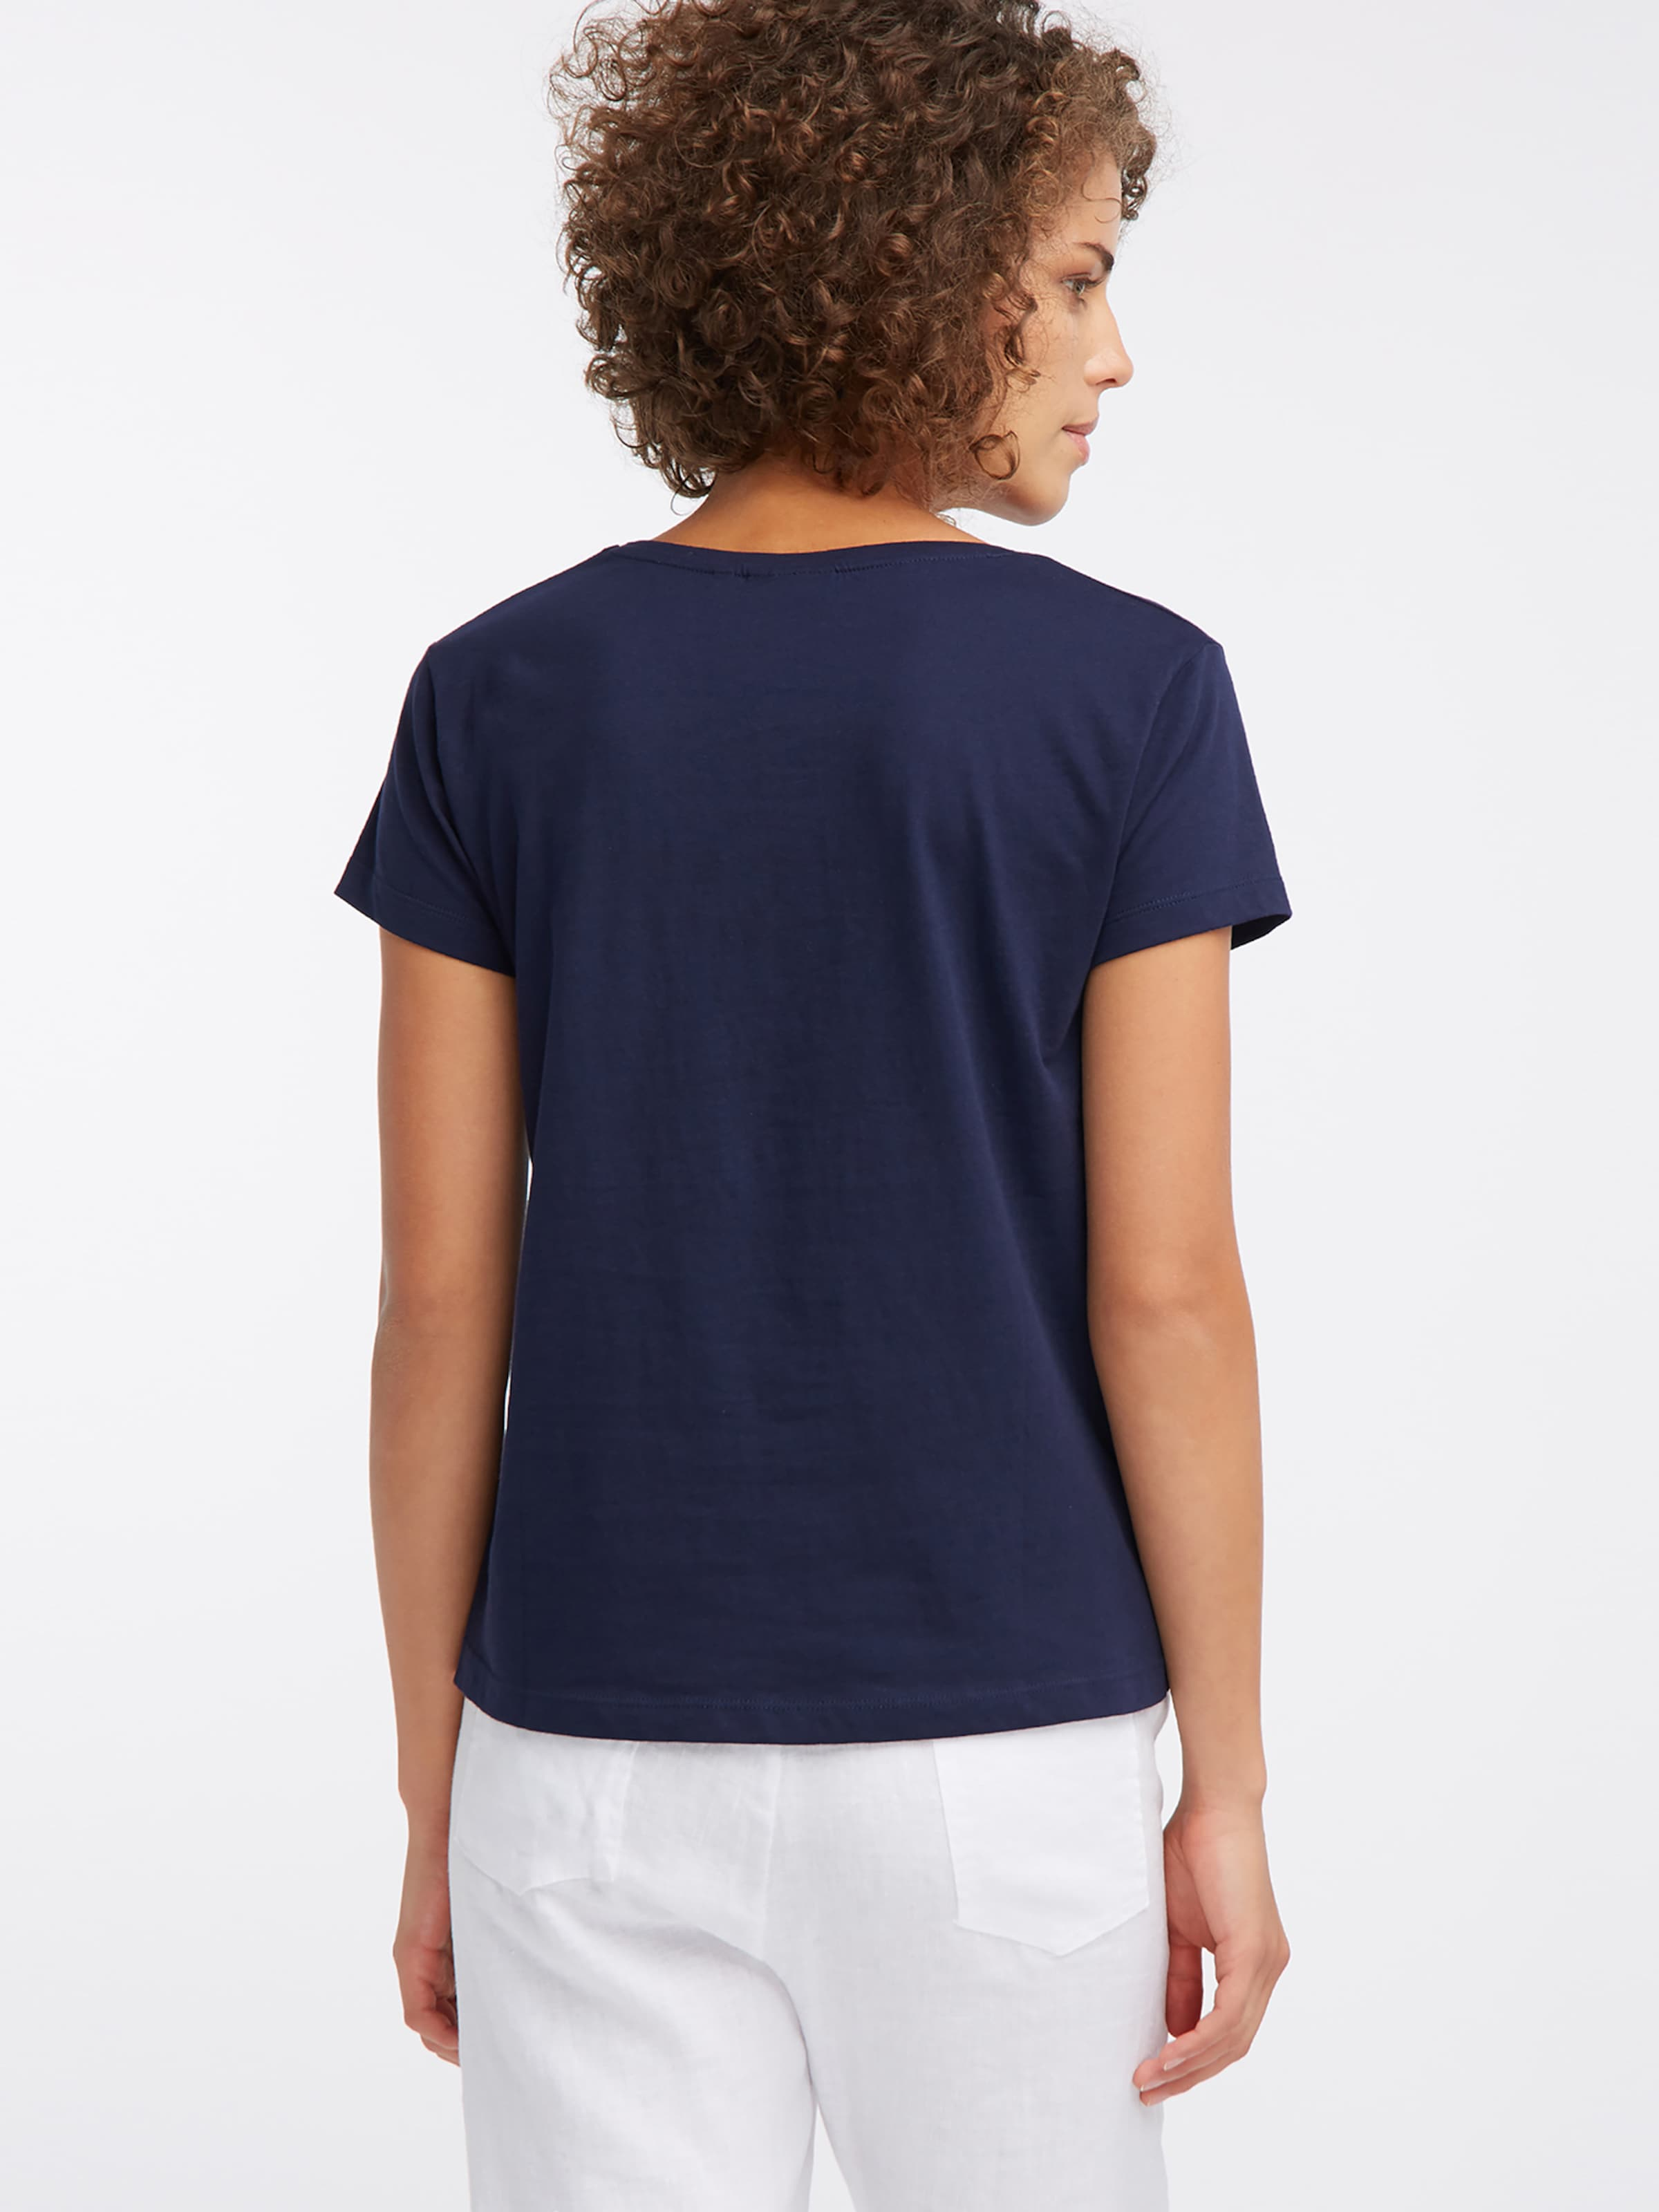 Broadway De Nyc Couleurs T Bleu 'charlize' Fashion MarineMélange En shirt w0OX8nkP